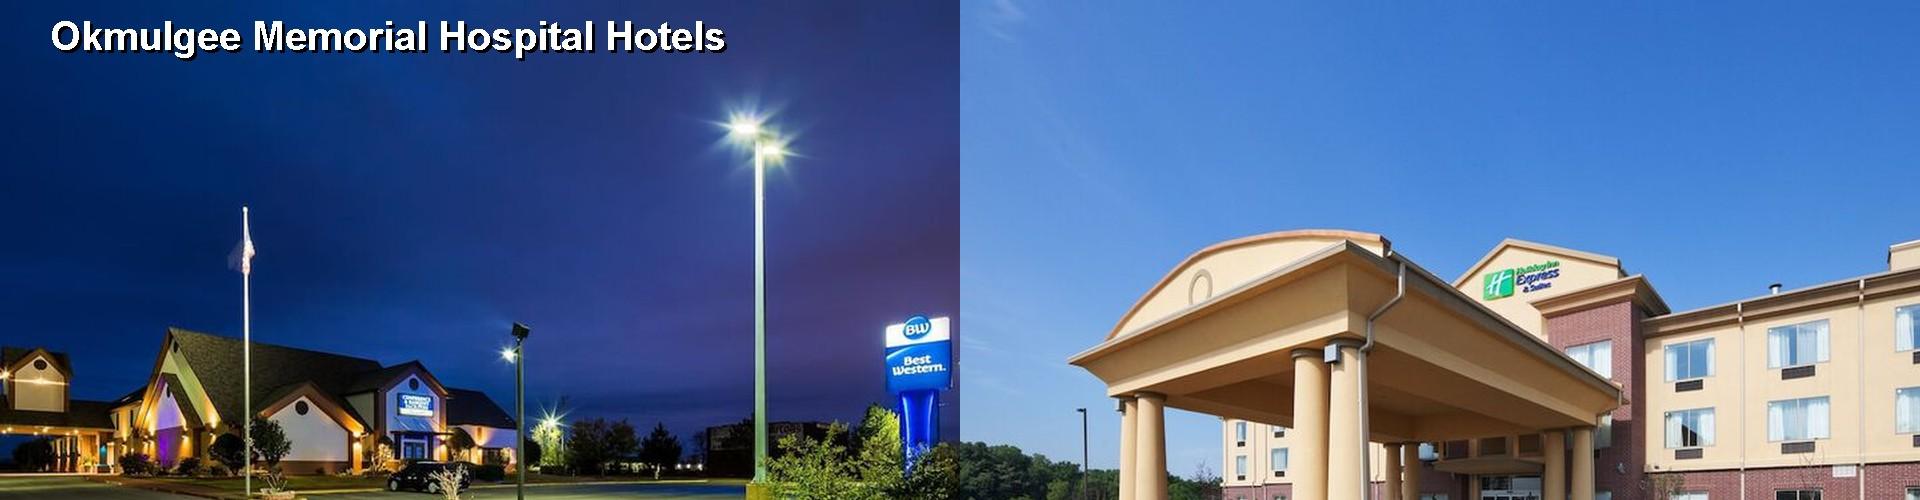 5 Best Hotels Near Okmulgee Memorial Hospital